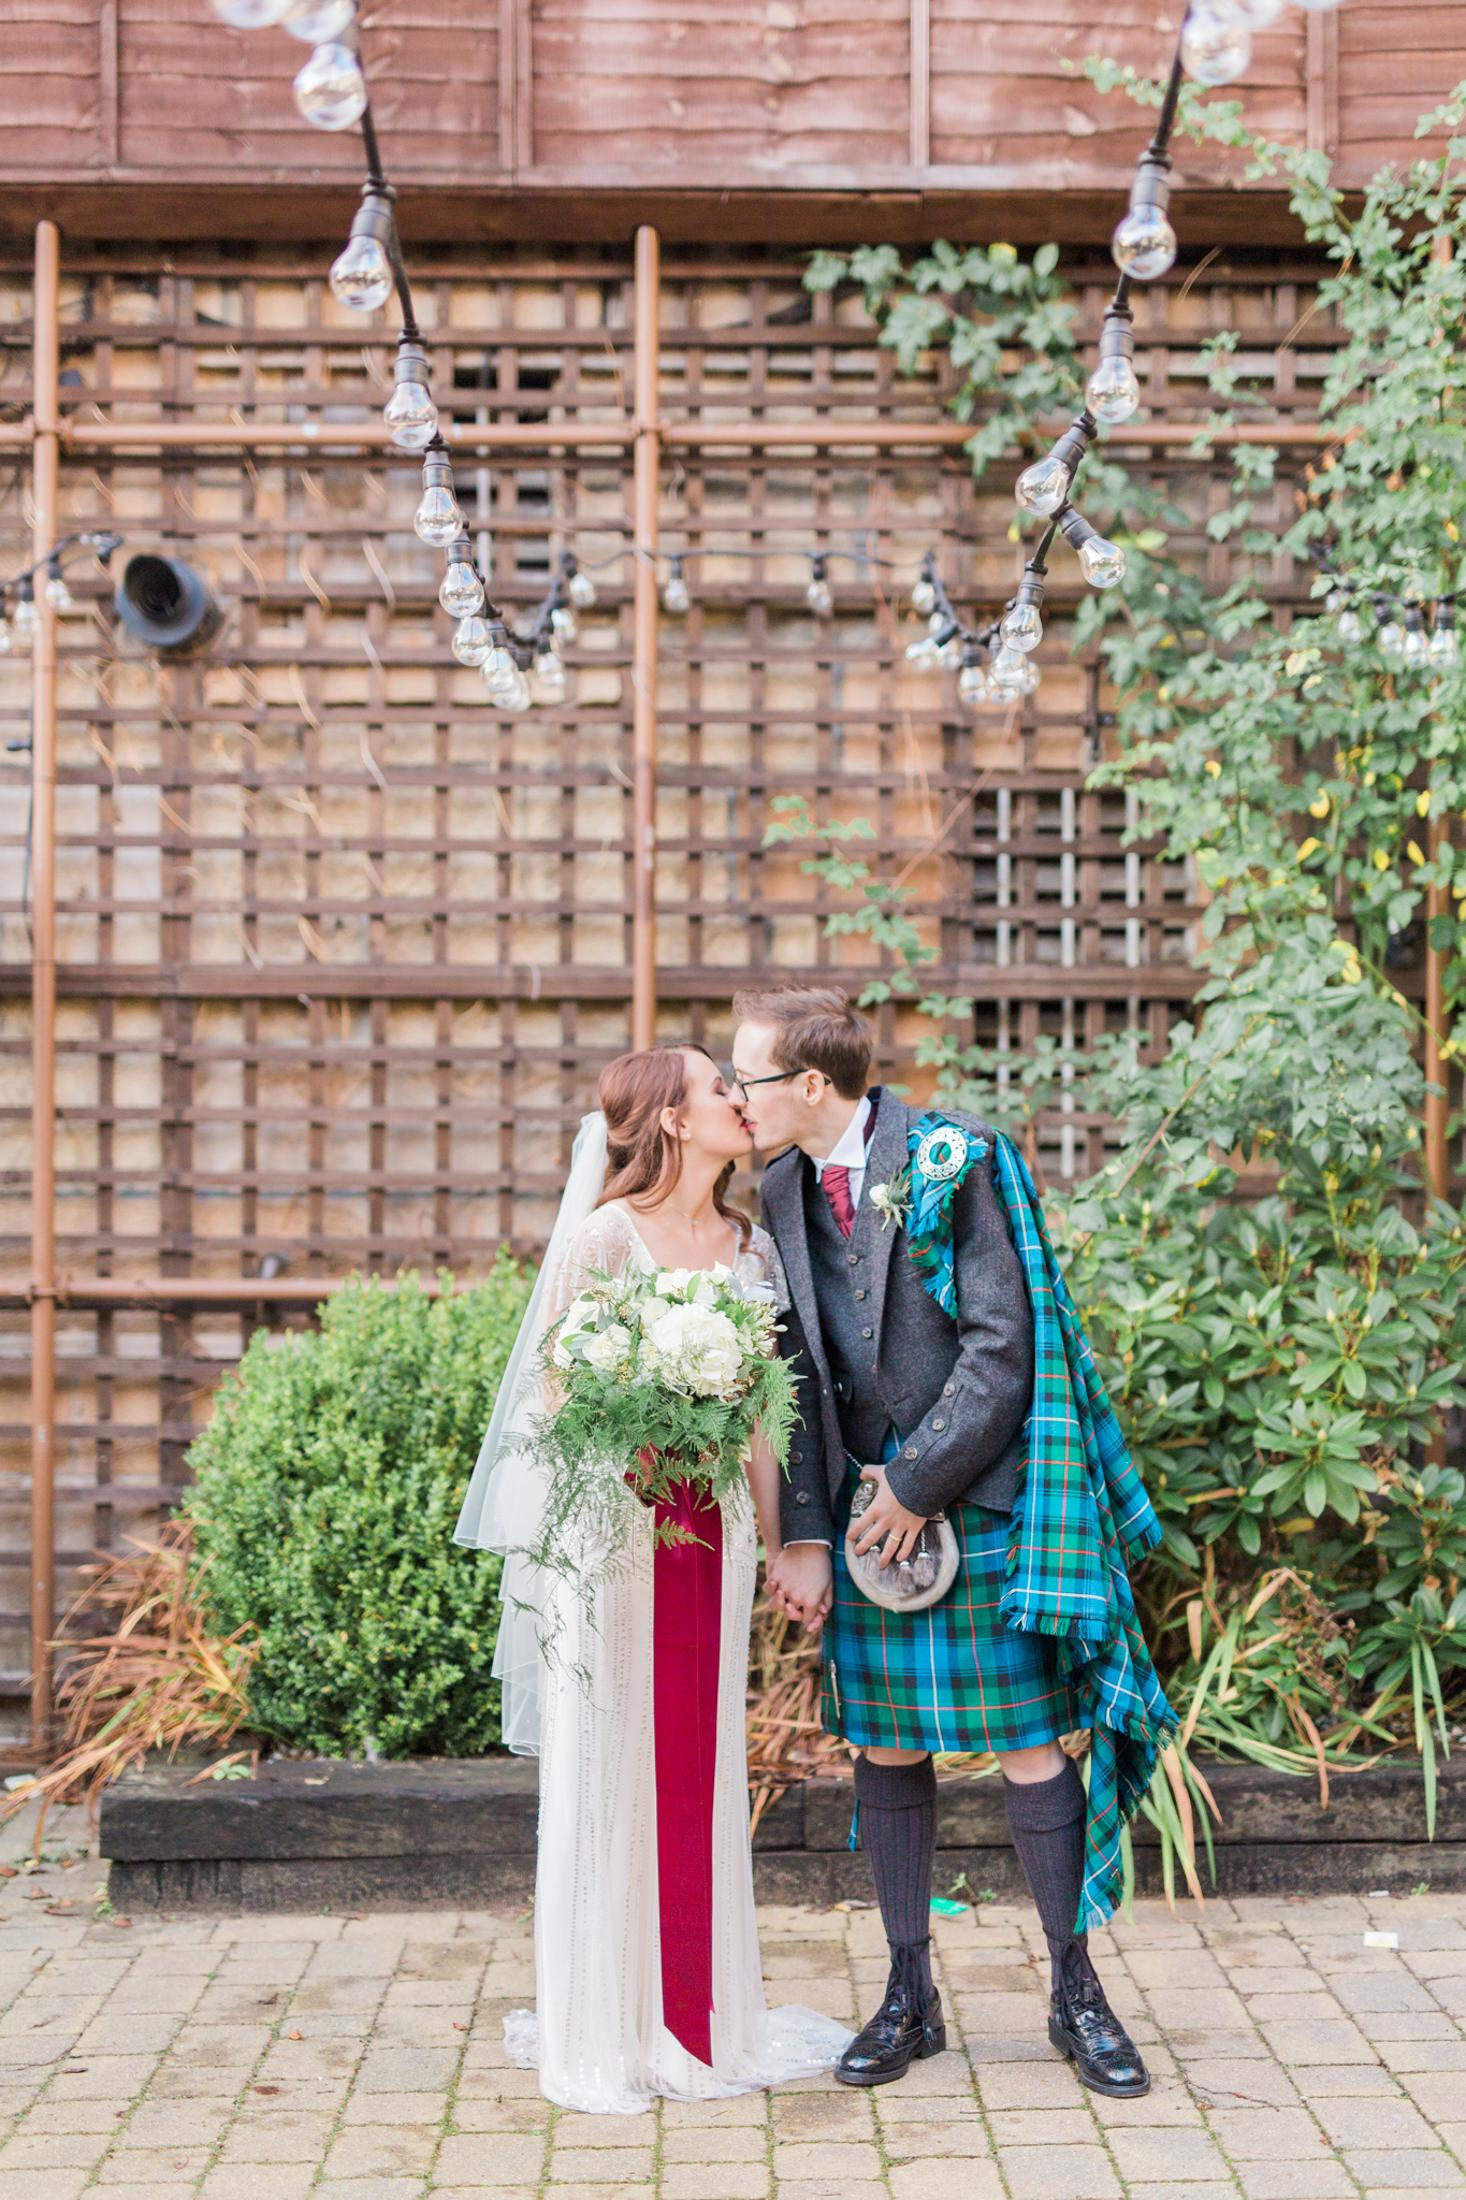 Suzanne_Li_photography_2016_DESTINATIONS_AND_WEDDINGS-56.jpg